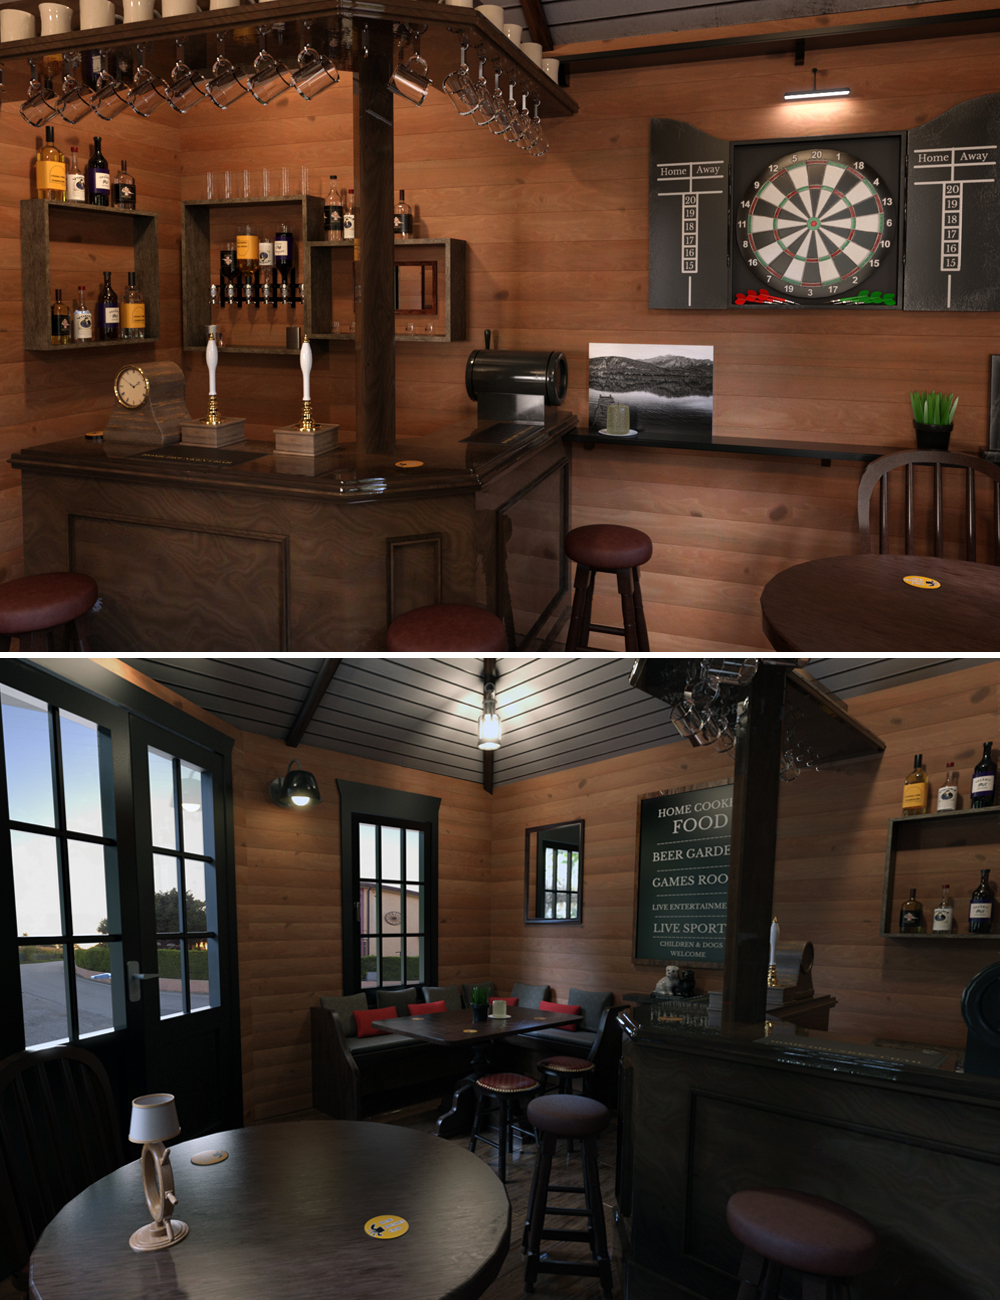 Home Drunken Crab by: Tesla3dCorp, 3D Models by Daz 3D